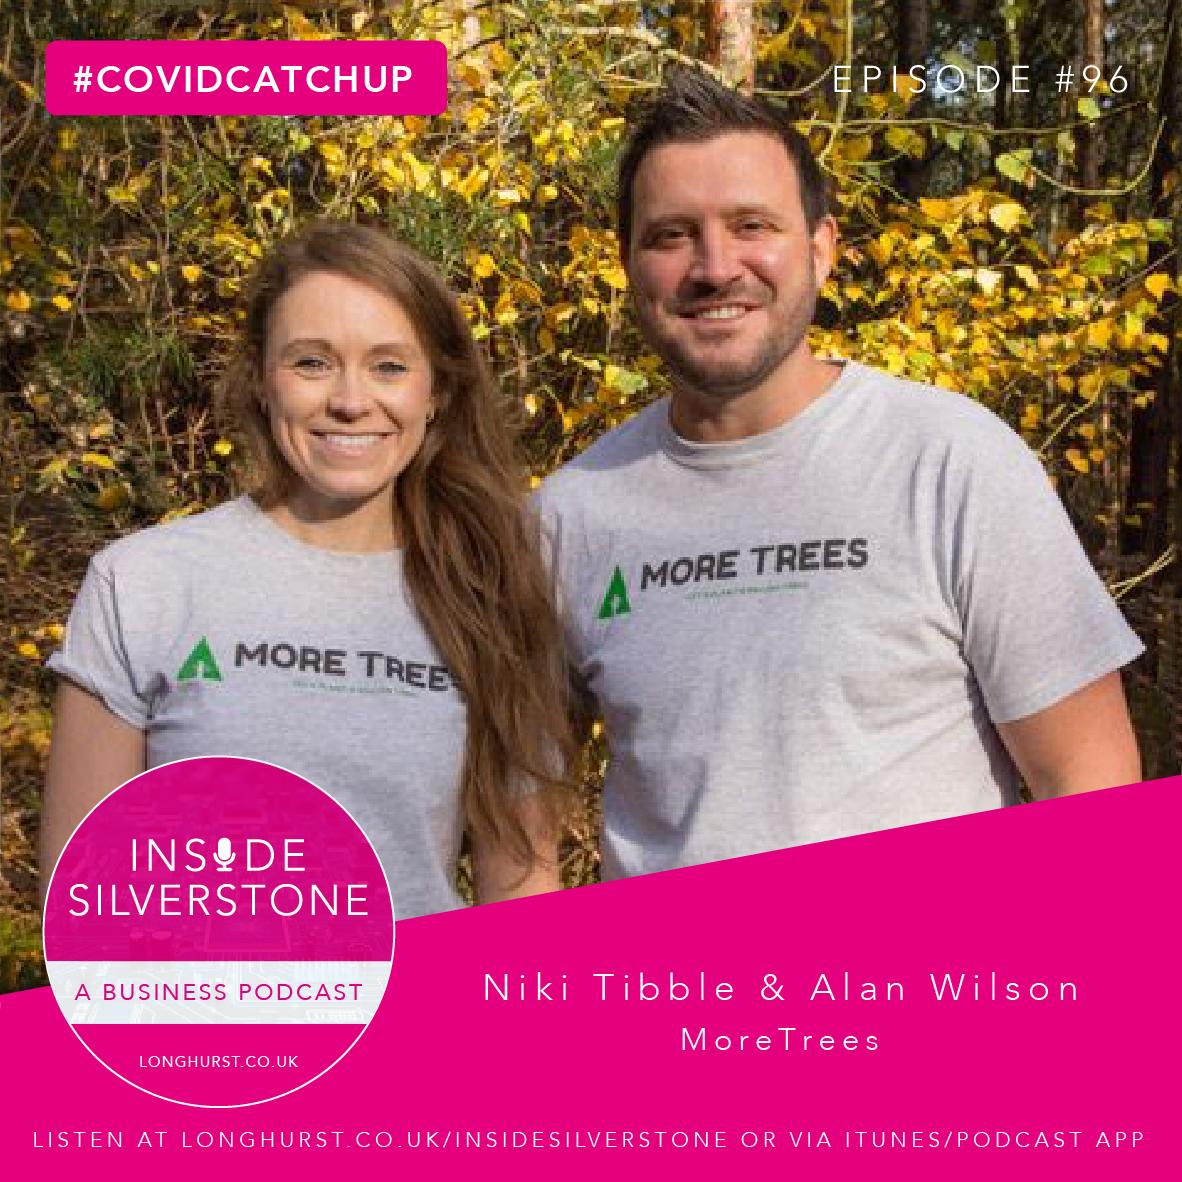 Alan Wilson & Niki Tibble of MoreTrees